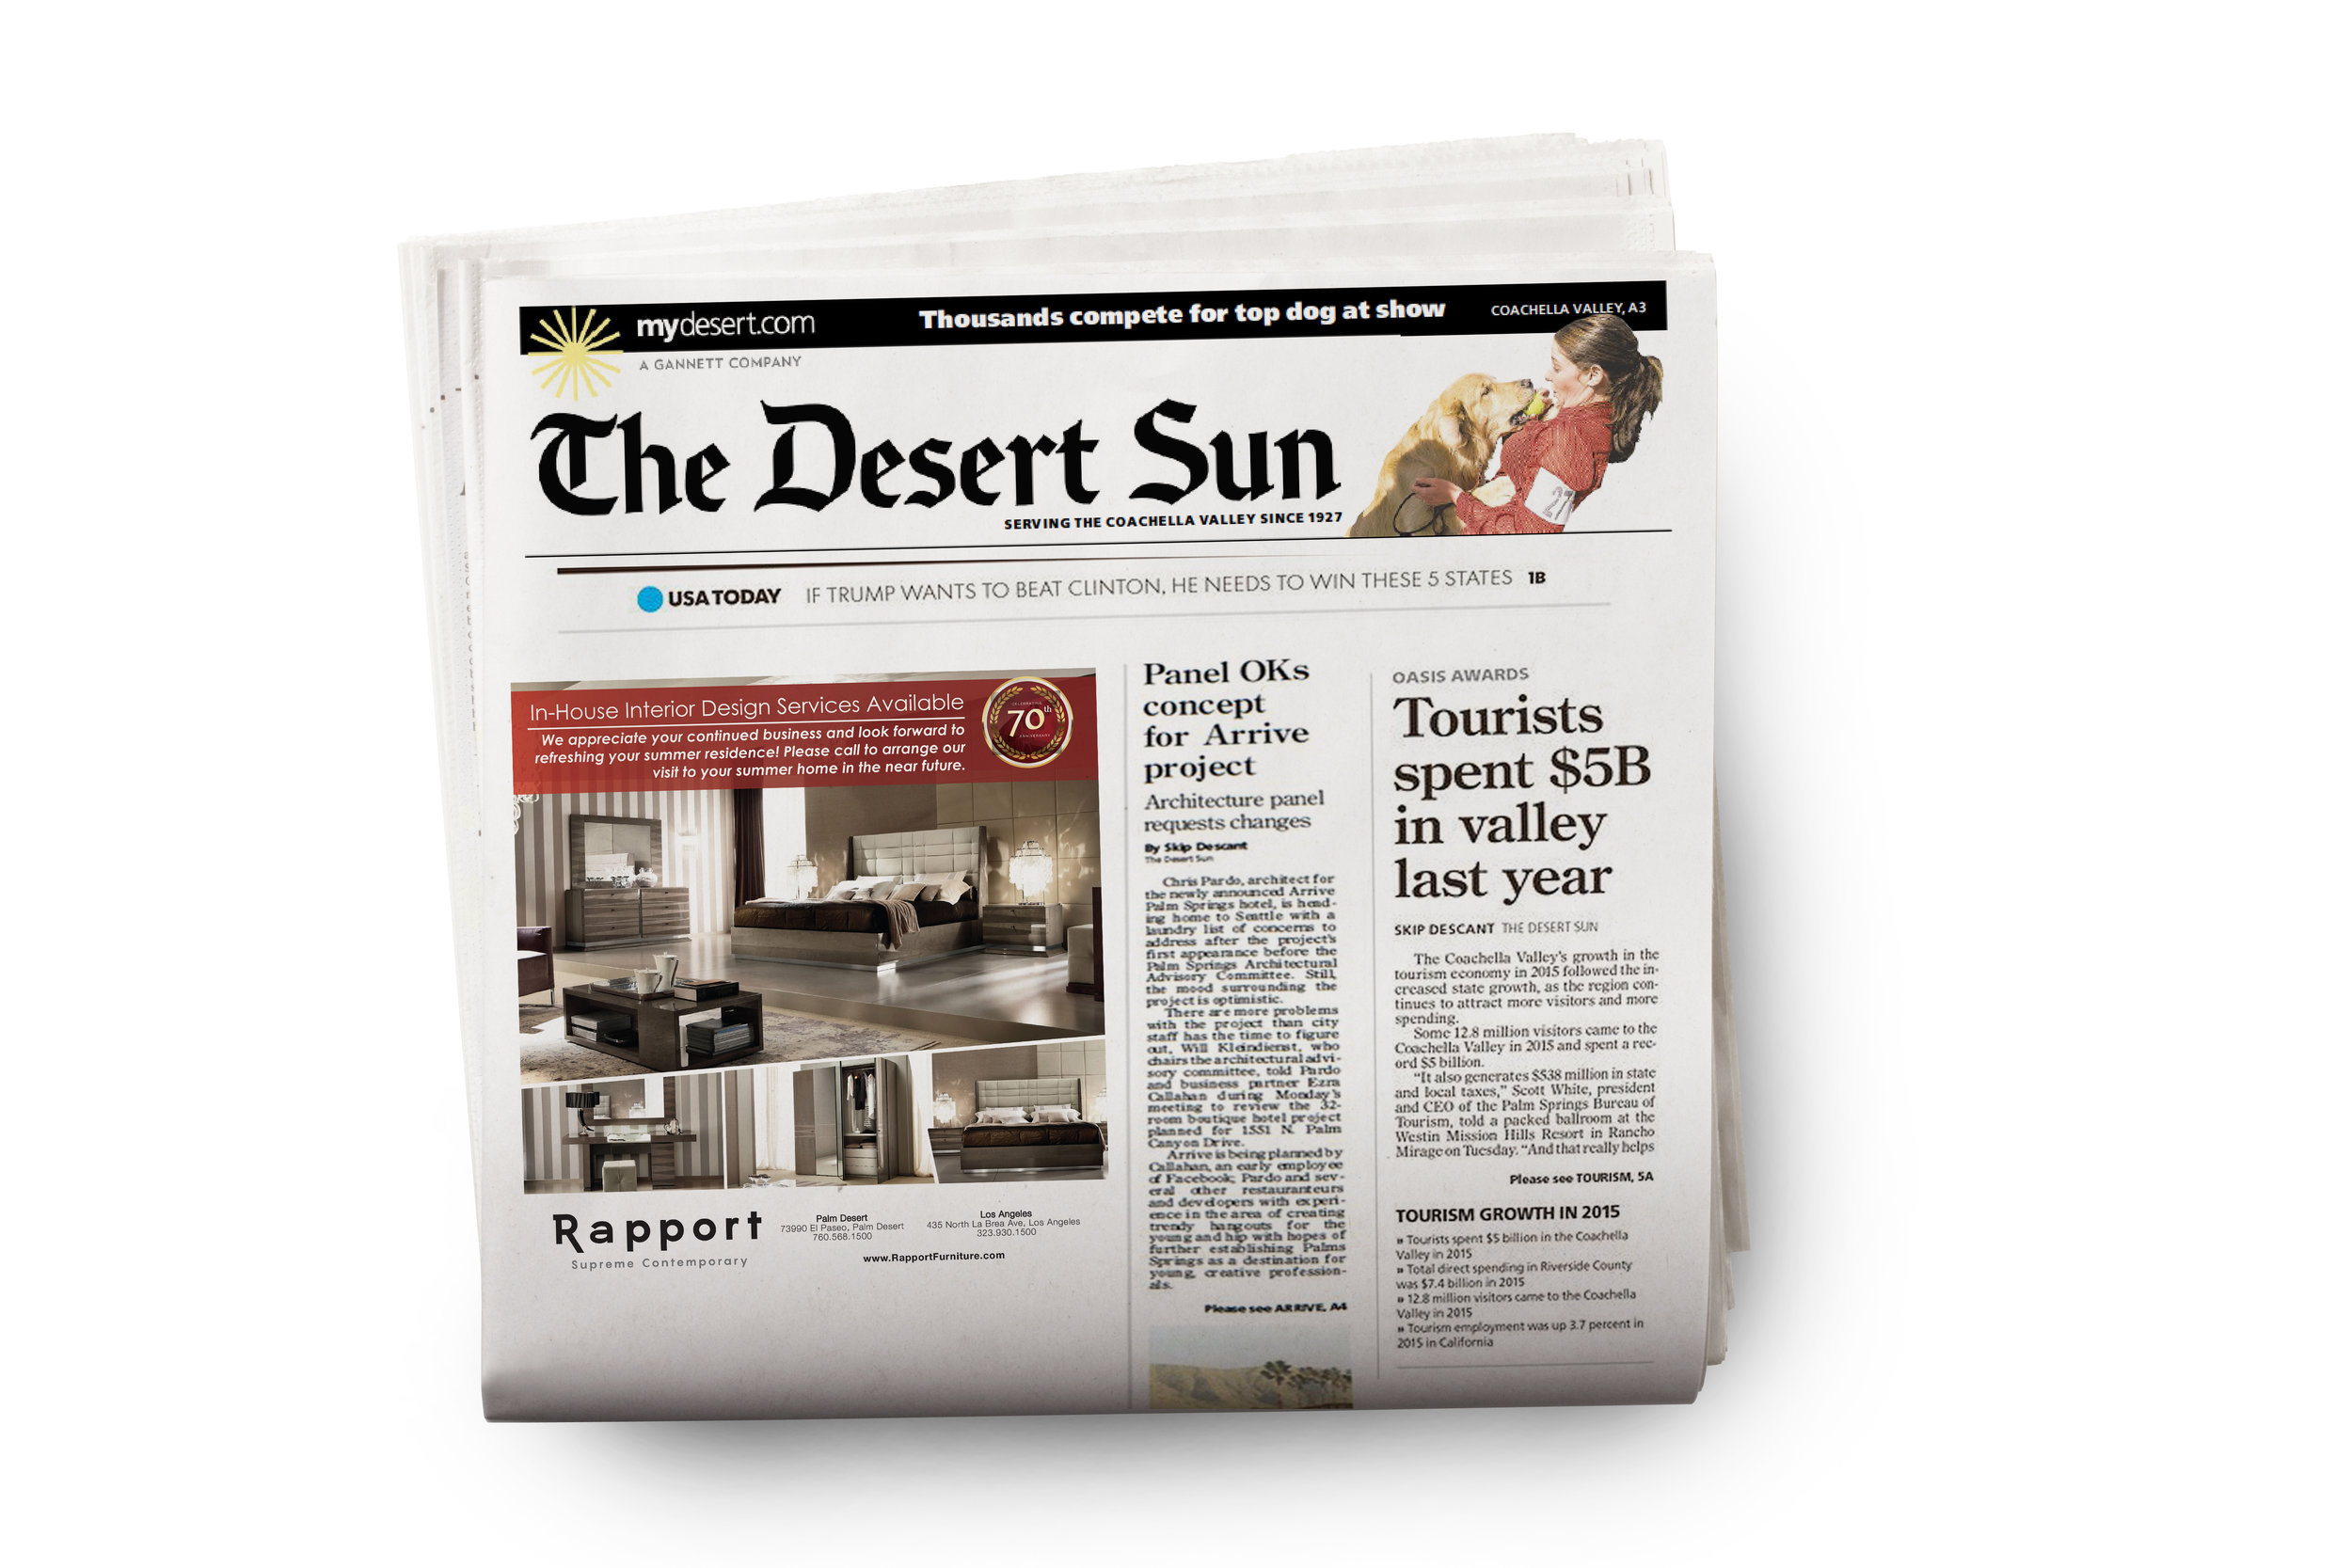 Rapport_DesertSunNewspaper_MOCKUP17.jpg